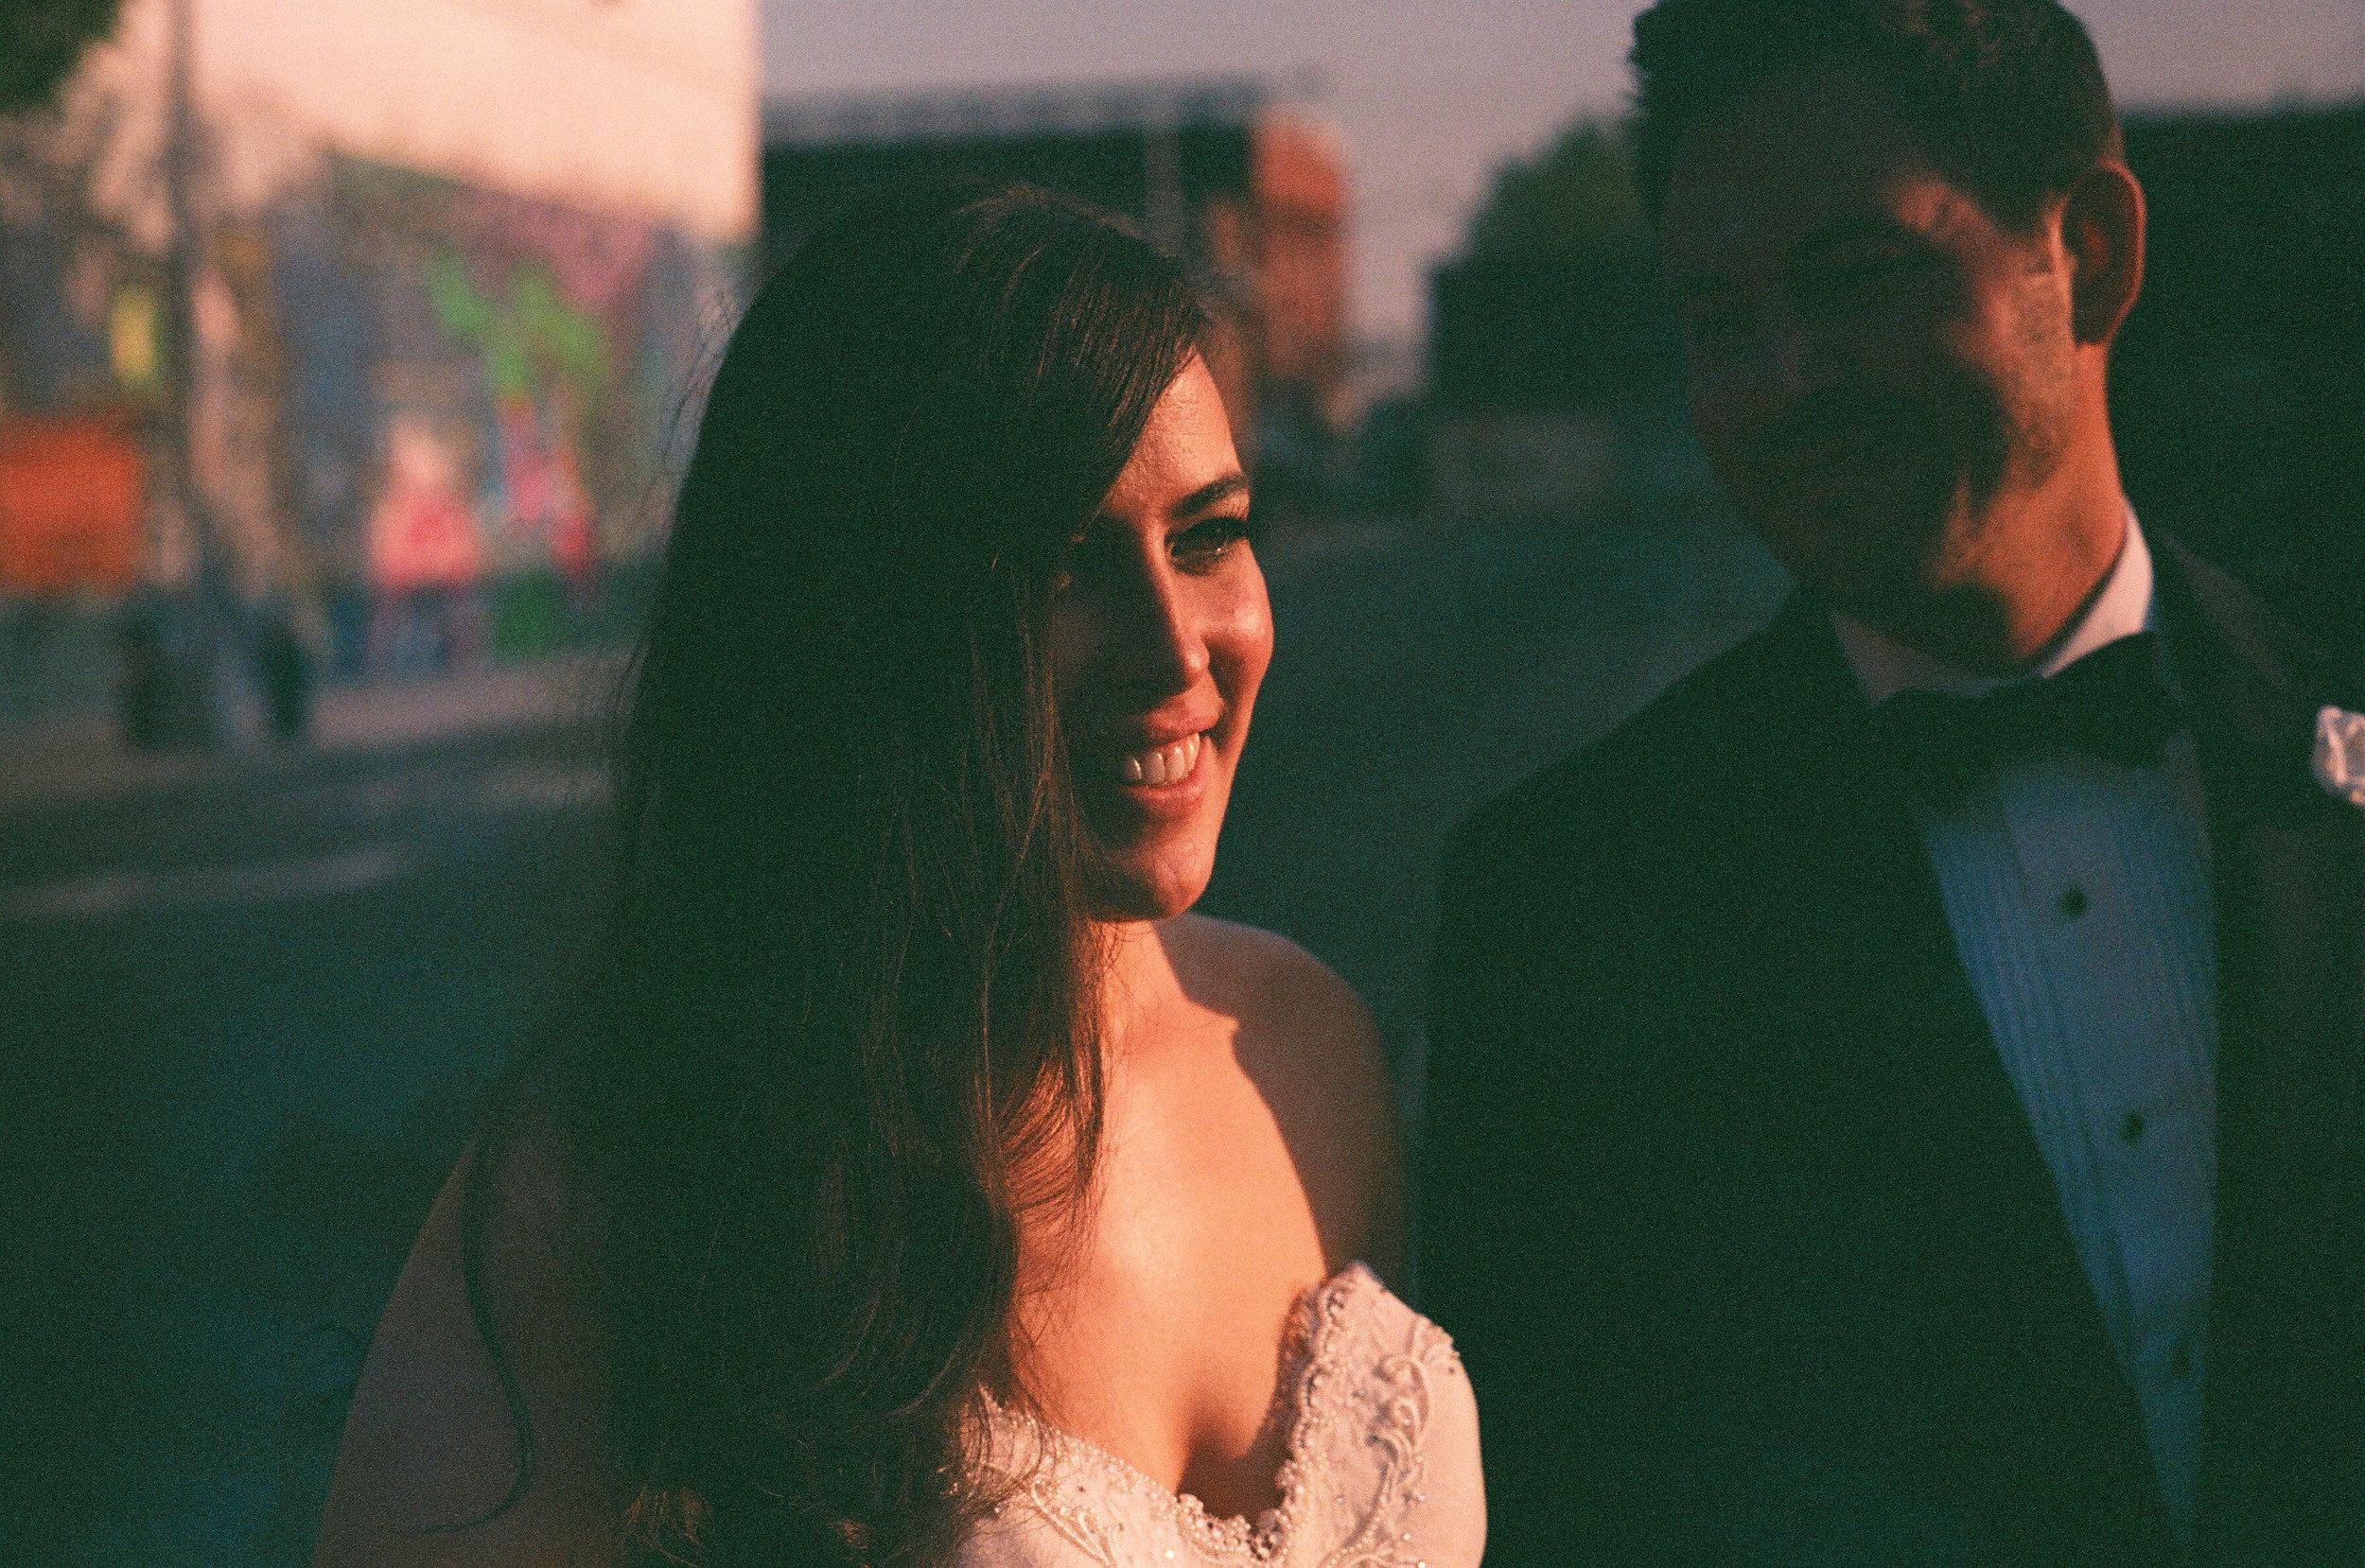 35mmfilmweddingphotographerlightleaksdoubleexposurebrooklyn(47of146).jpg